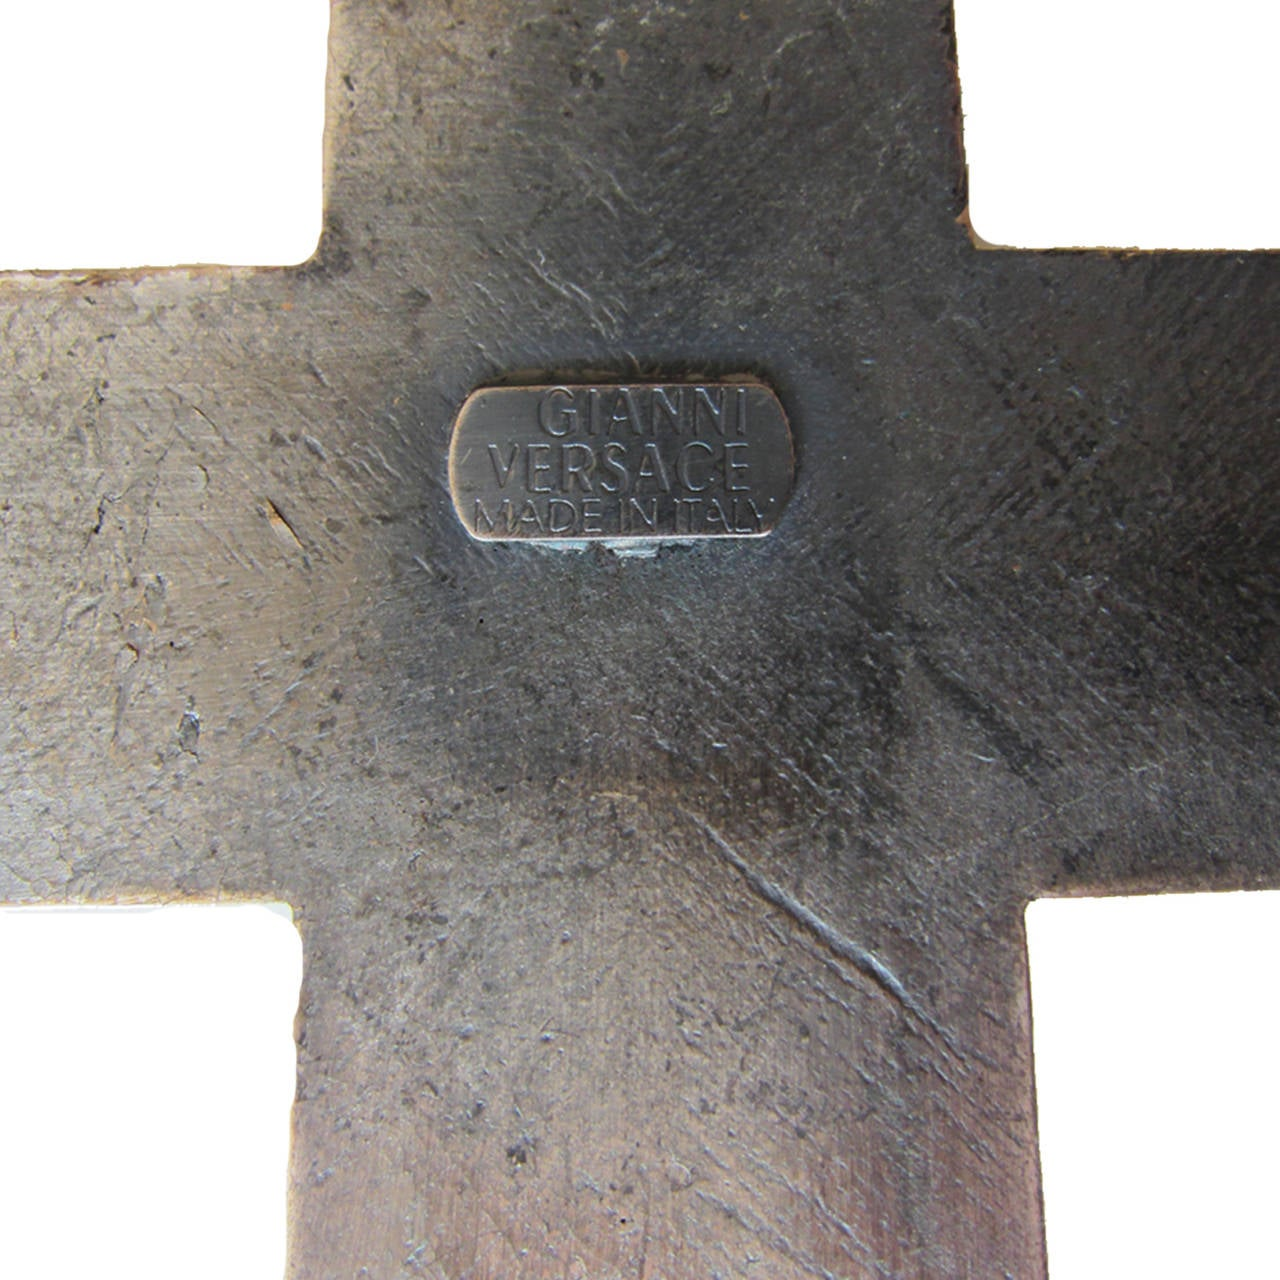 Gianni Versace Massive Cross Necklace 1990's 5